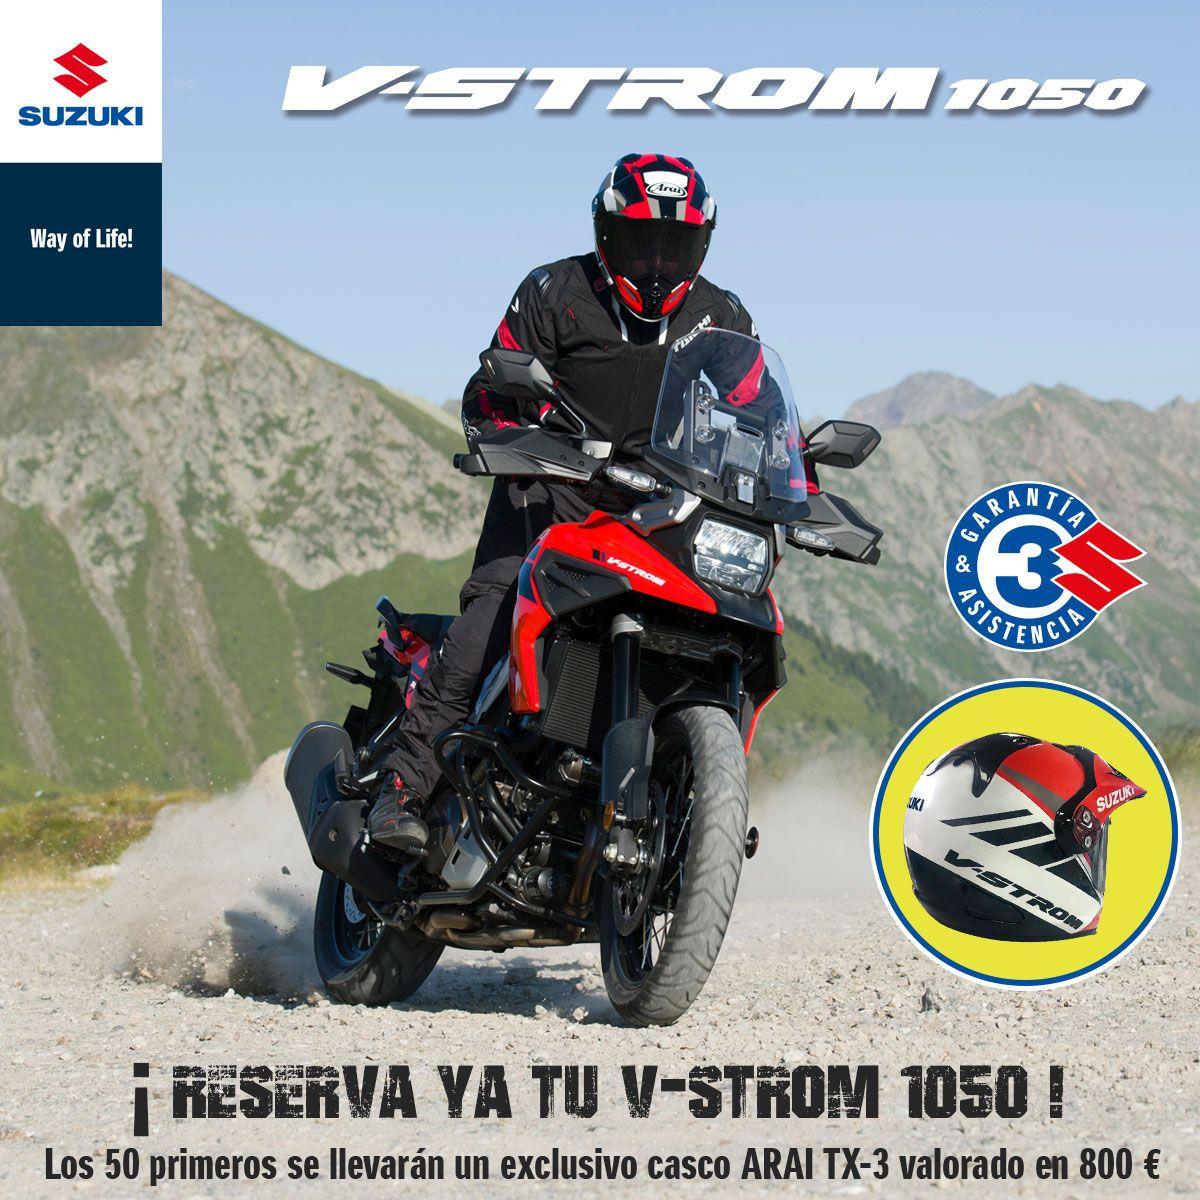 Reserva ya nueva tu Suzuki V-Strom 1050